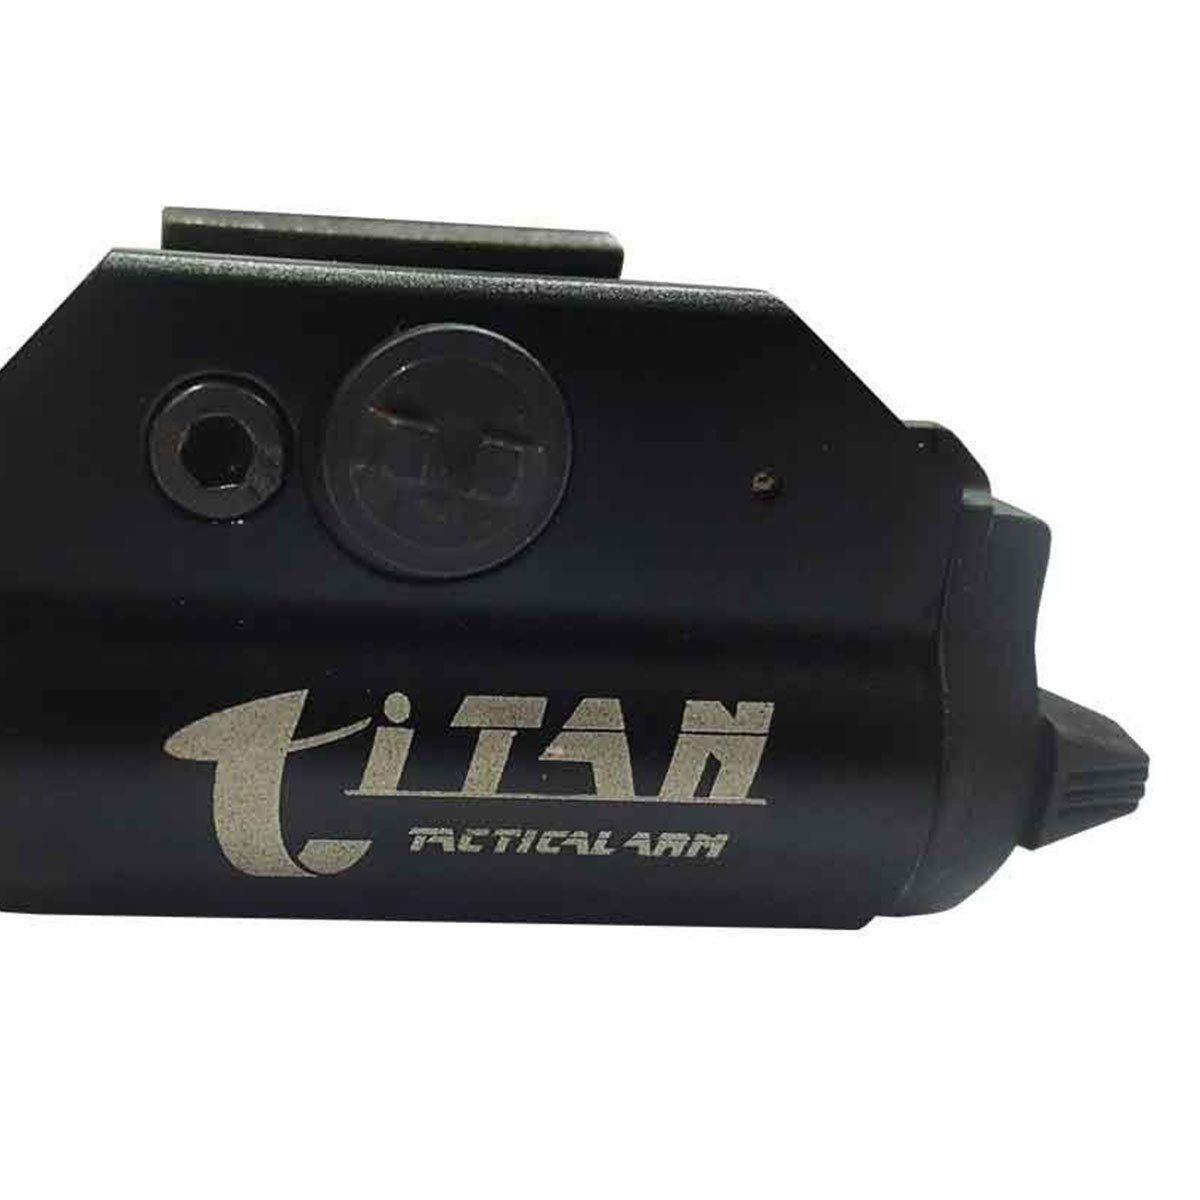 Lanterna Tática Titan TL-T9 180 Lumens